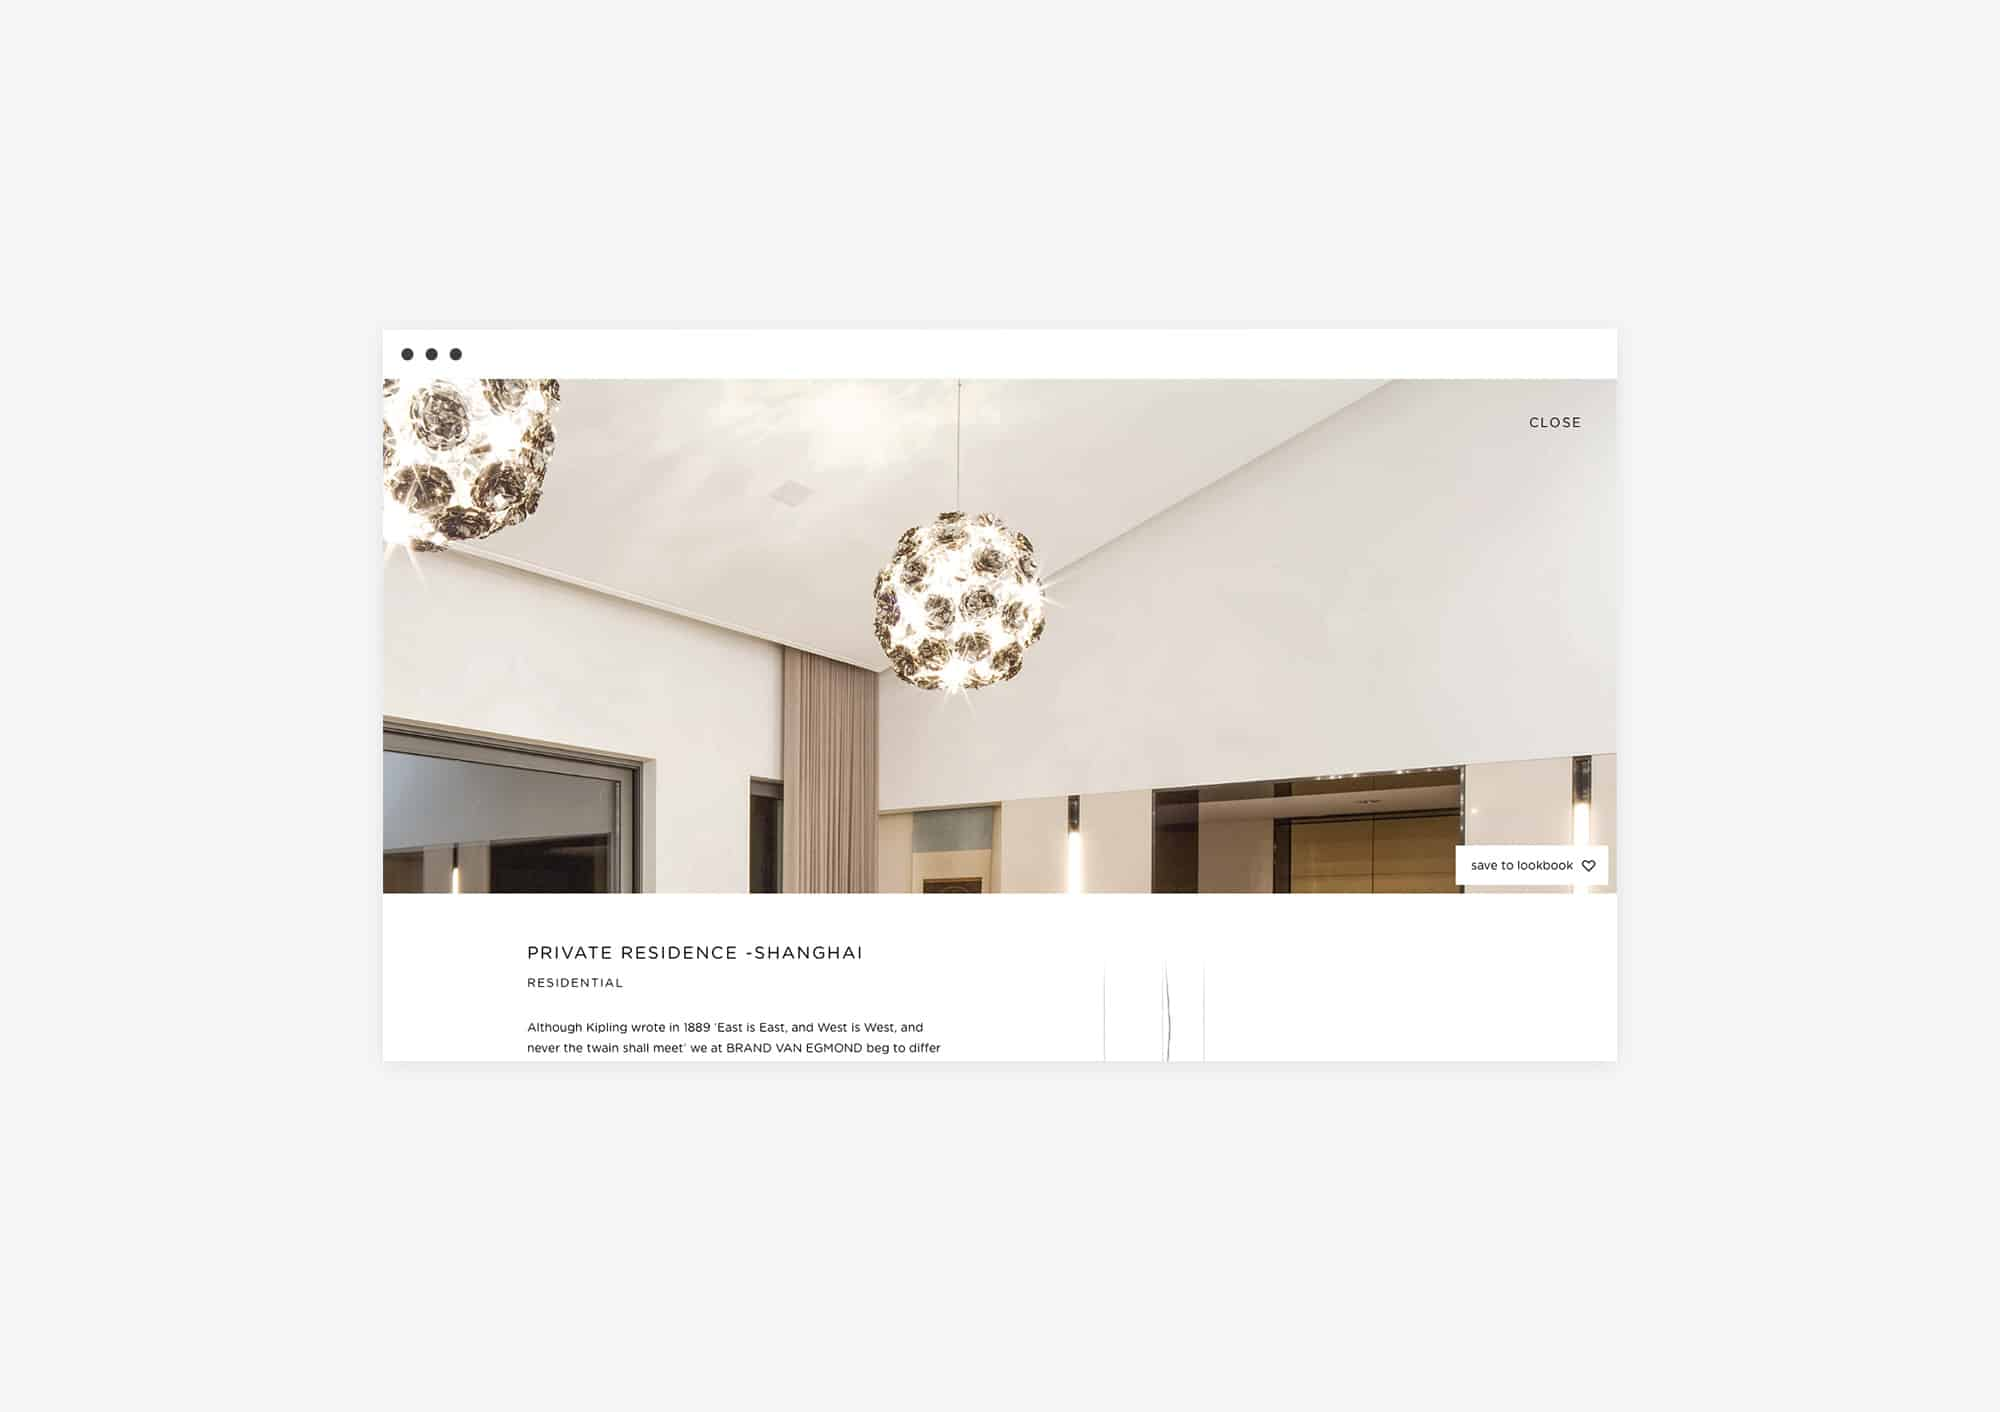 Project page design website for Brand van Egmond